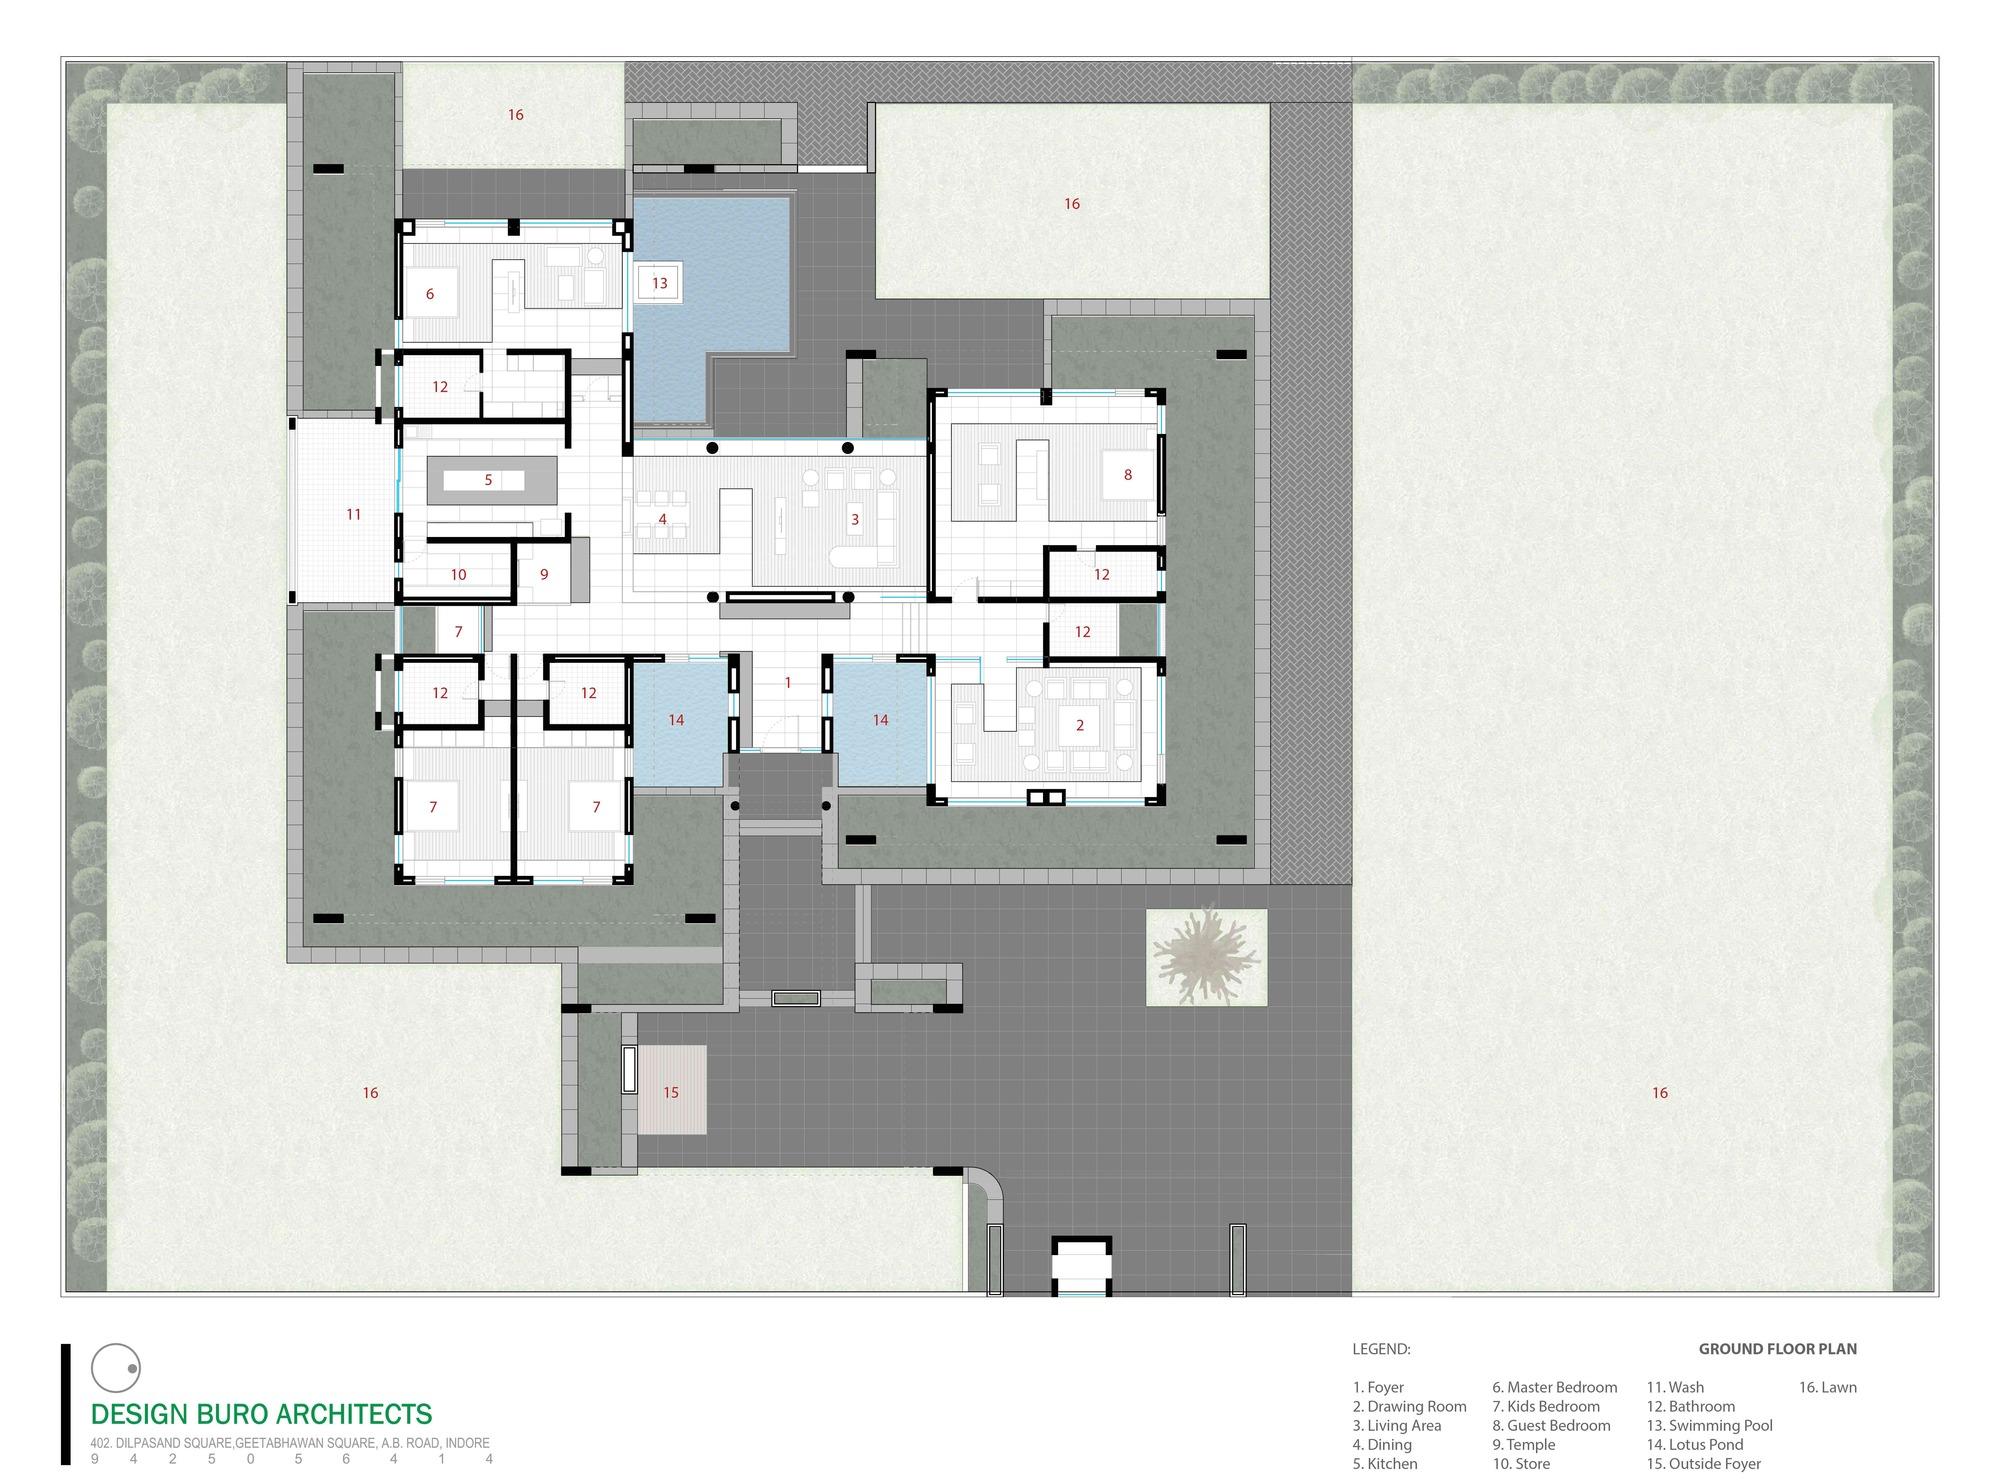 galeria de casa apex design buro architects 39. Black Bedroom Furniture Sets. Home Design Ideas